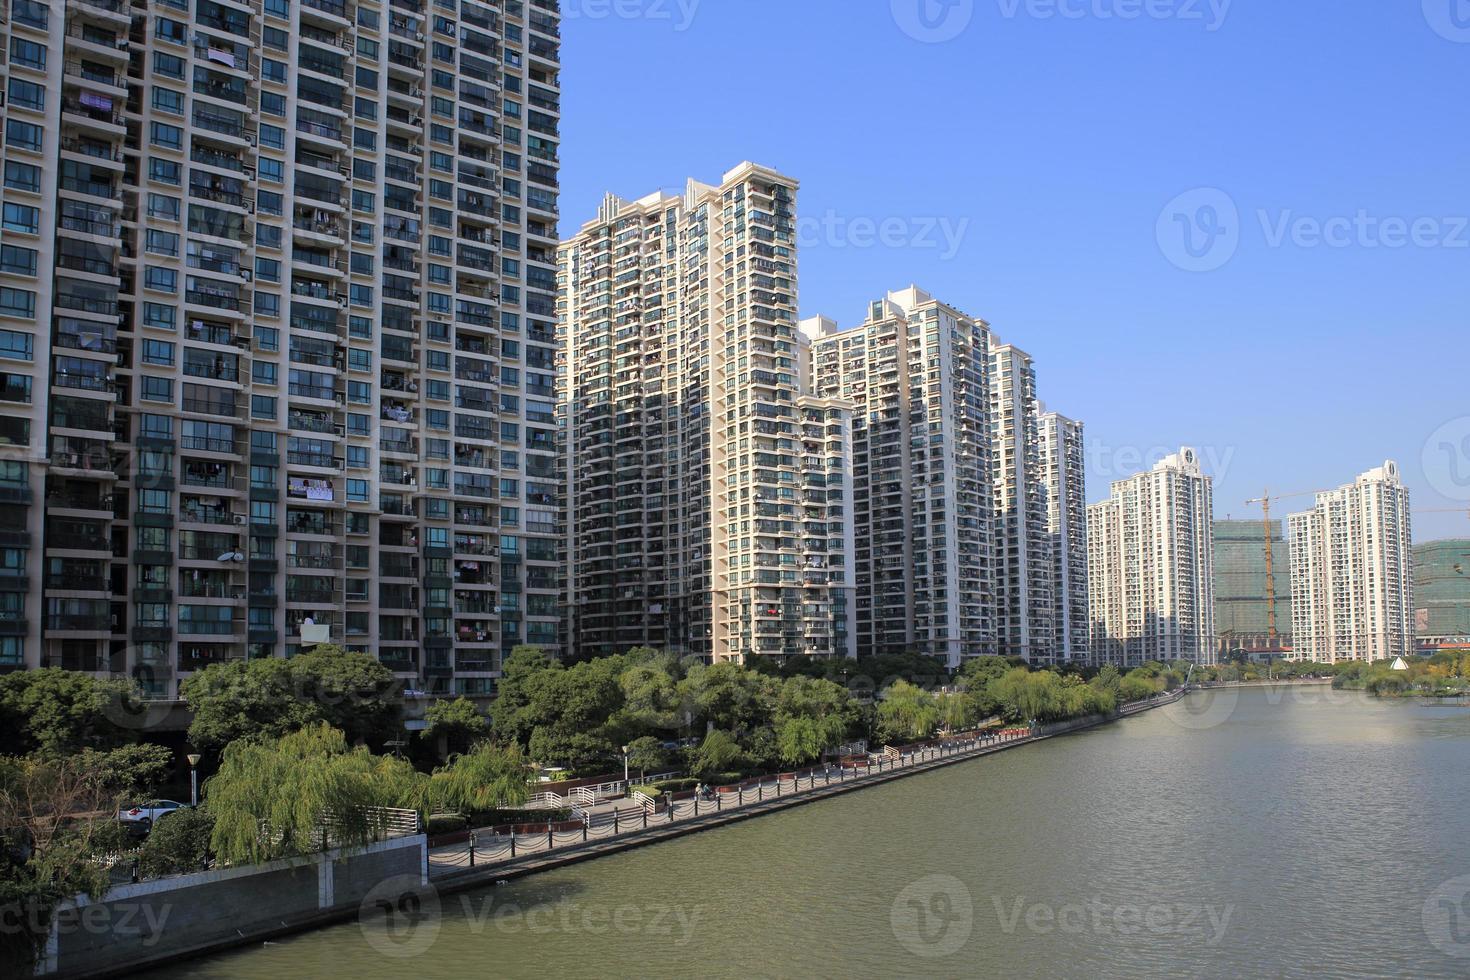 shanghai suzhou river park appartementen foto